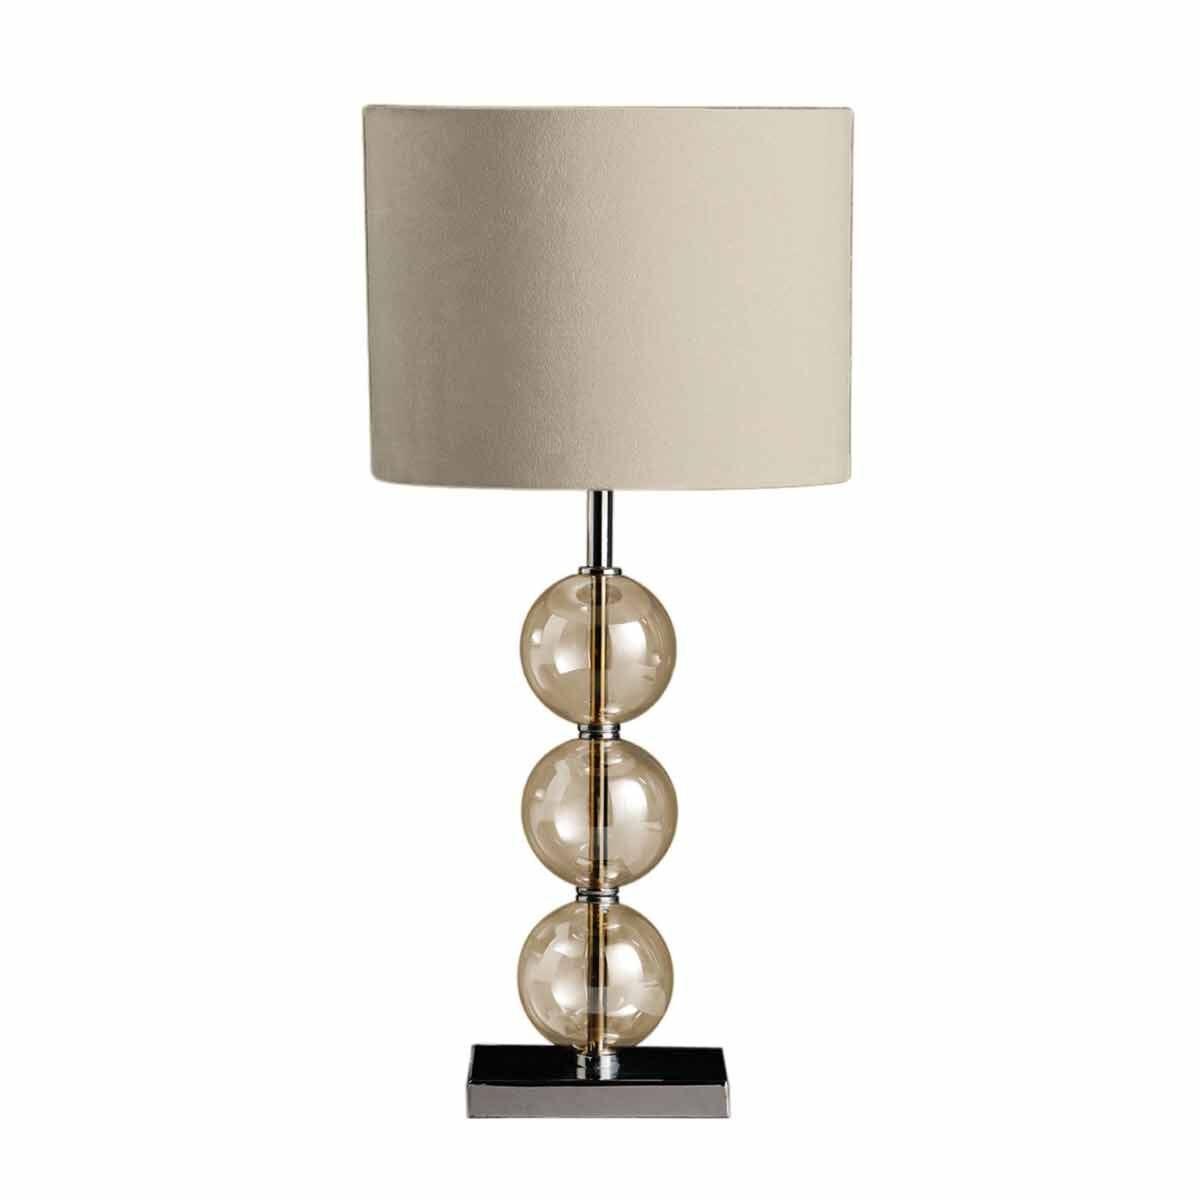 Premier Housewares Mistro Table Lamp Cream